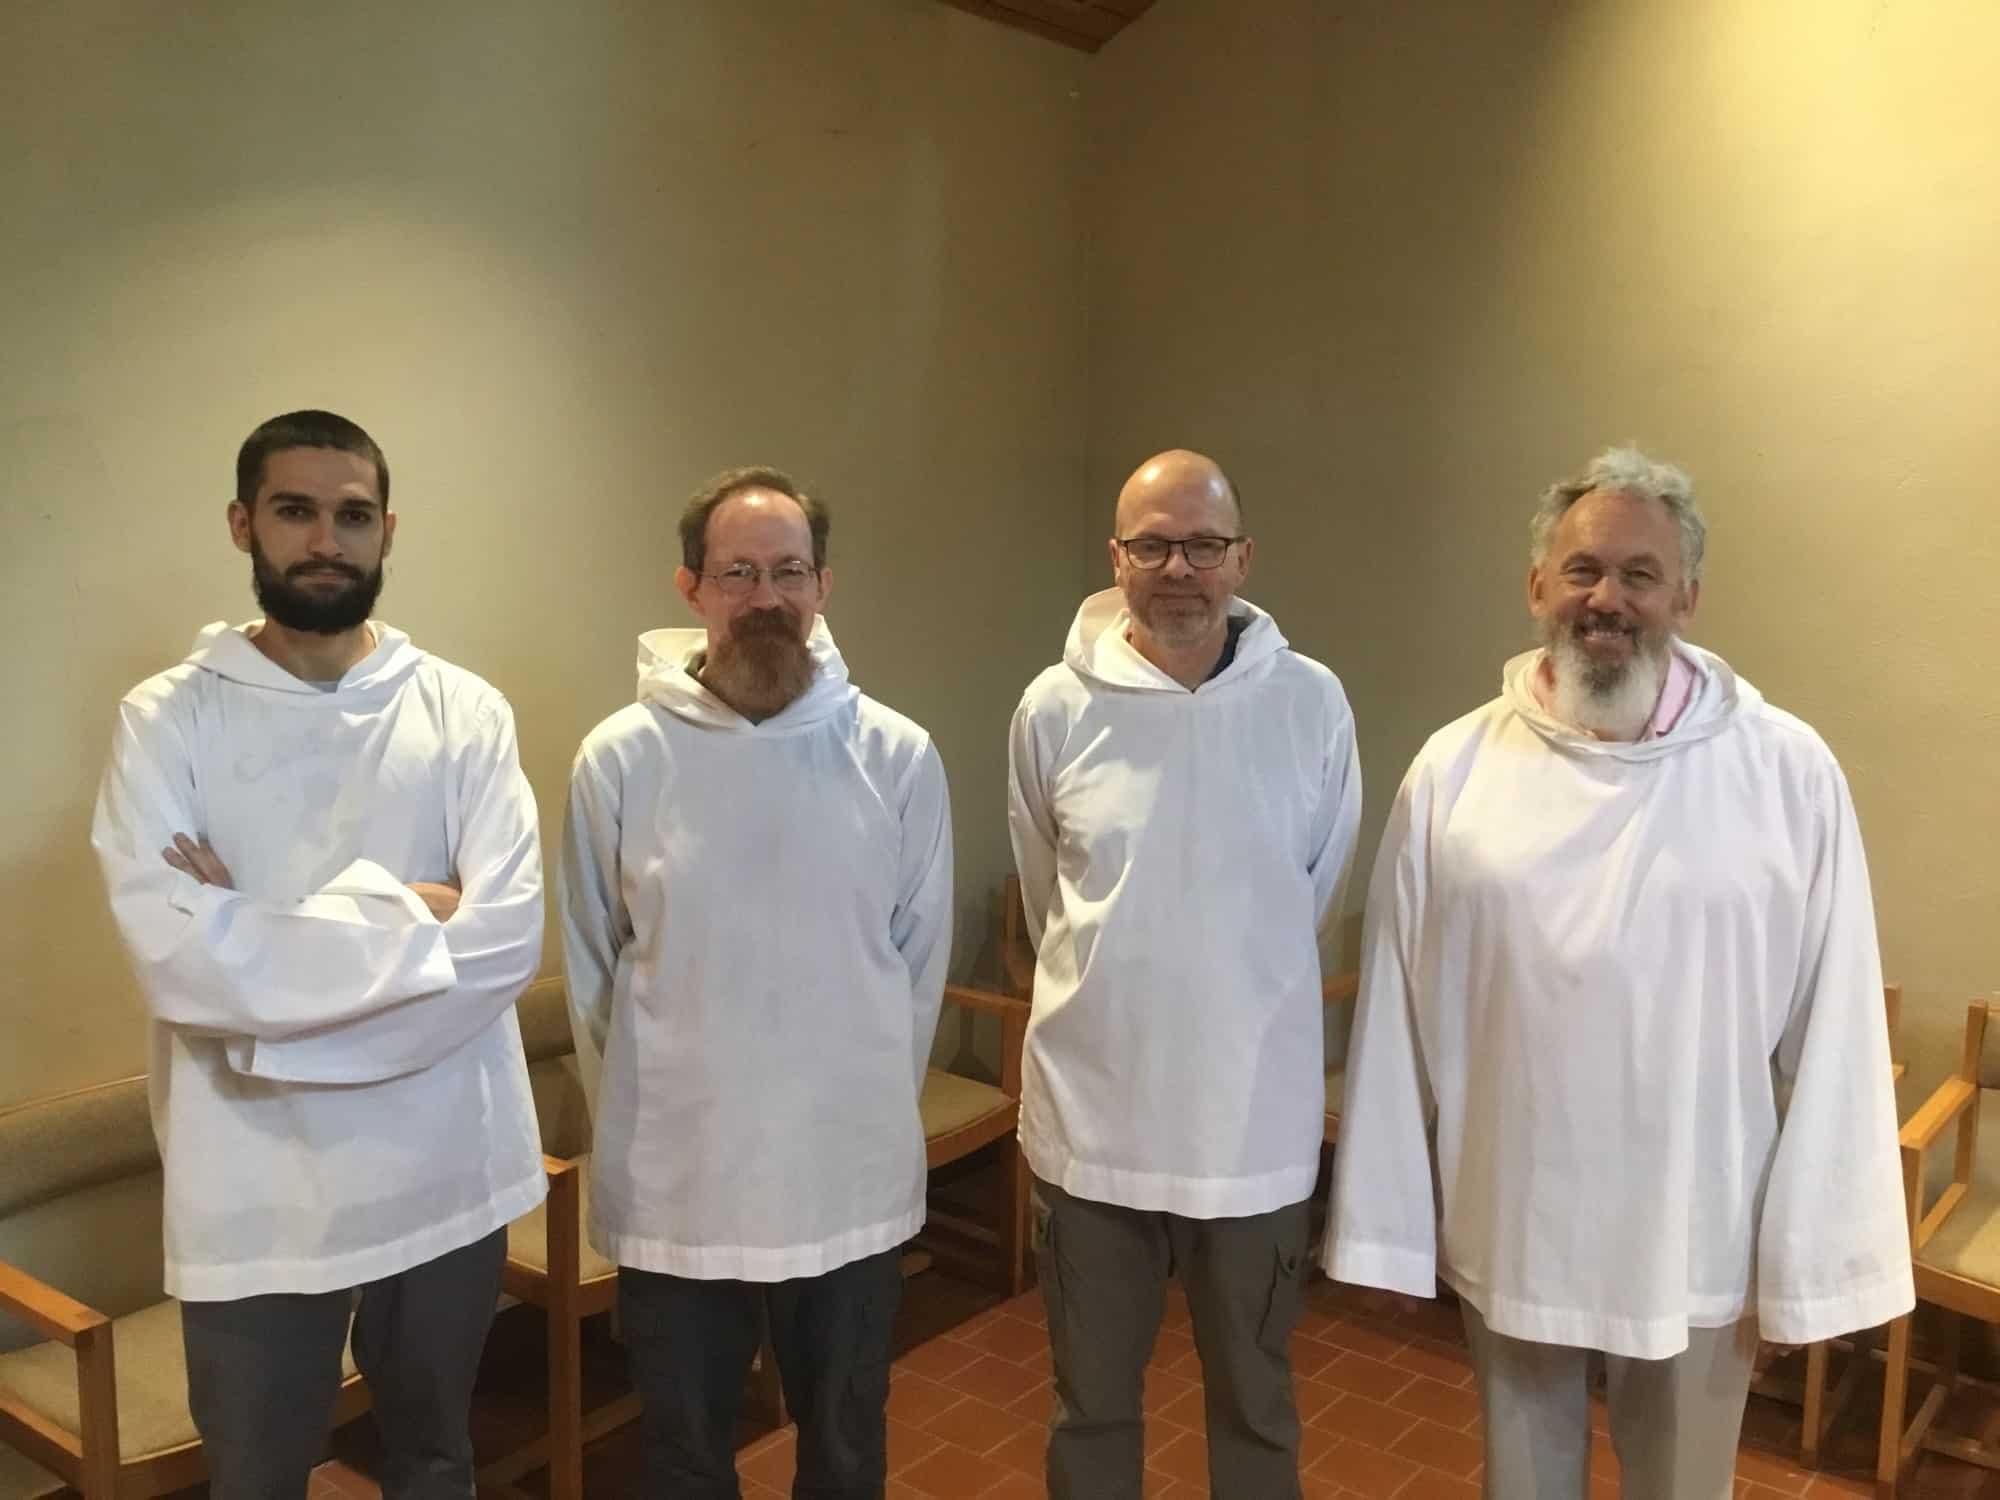 Mepkin Abbey has four new postulants